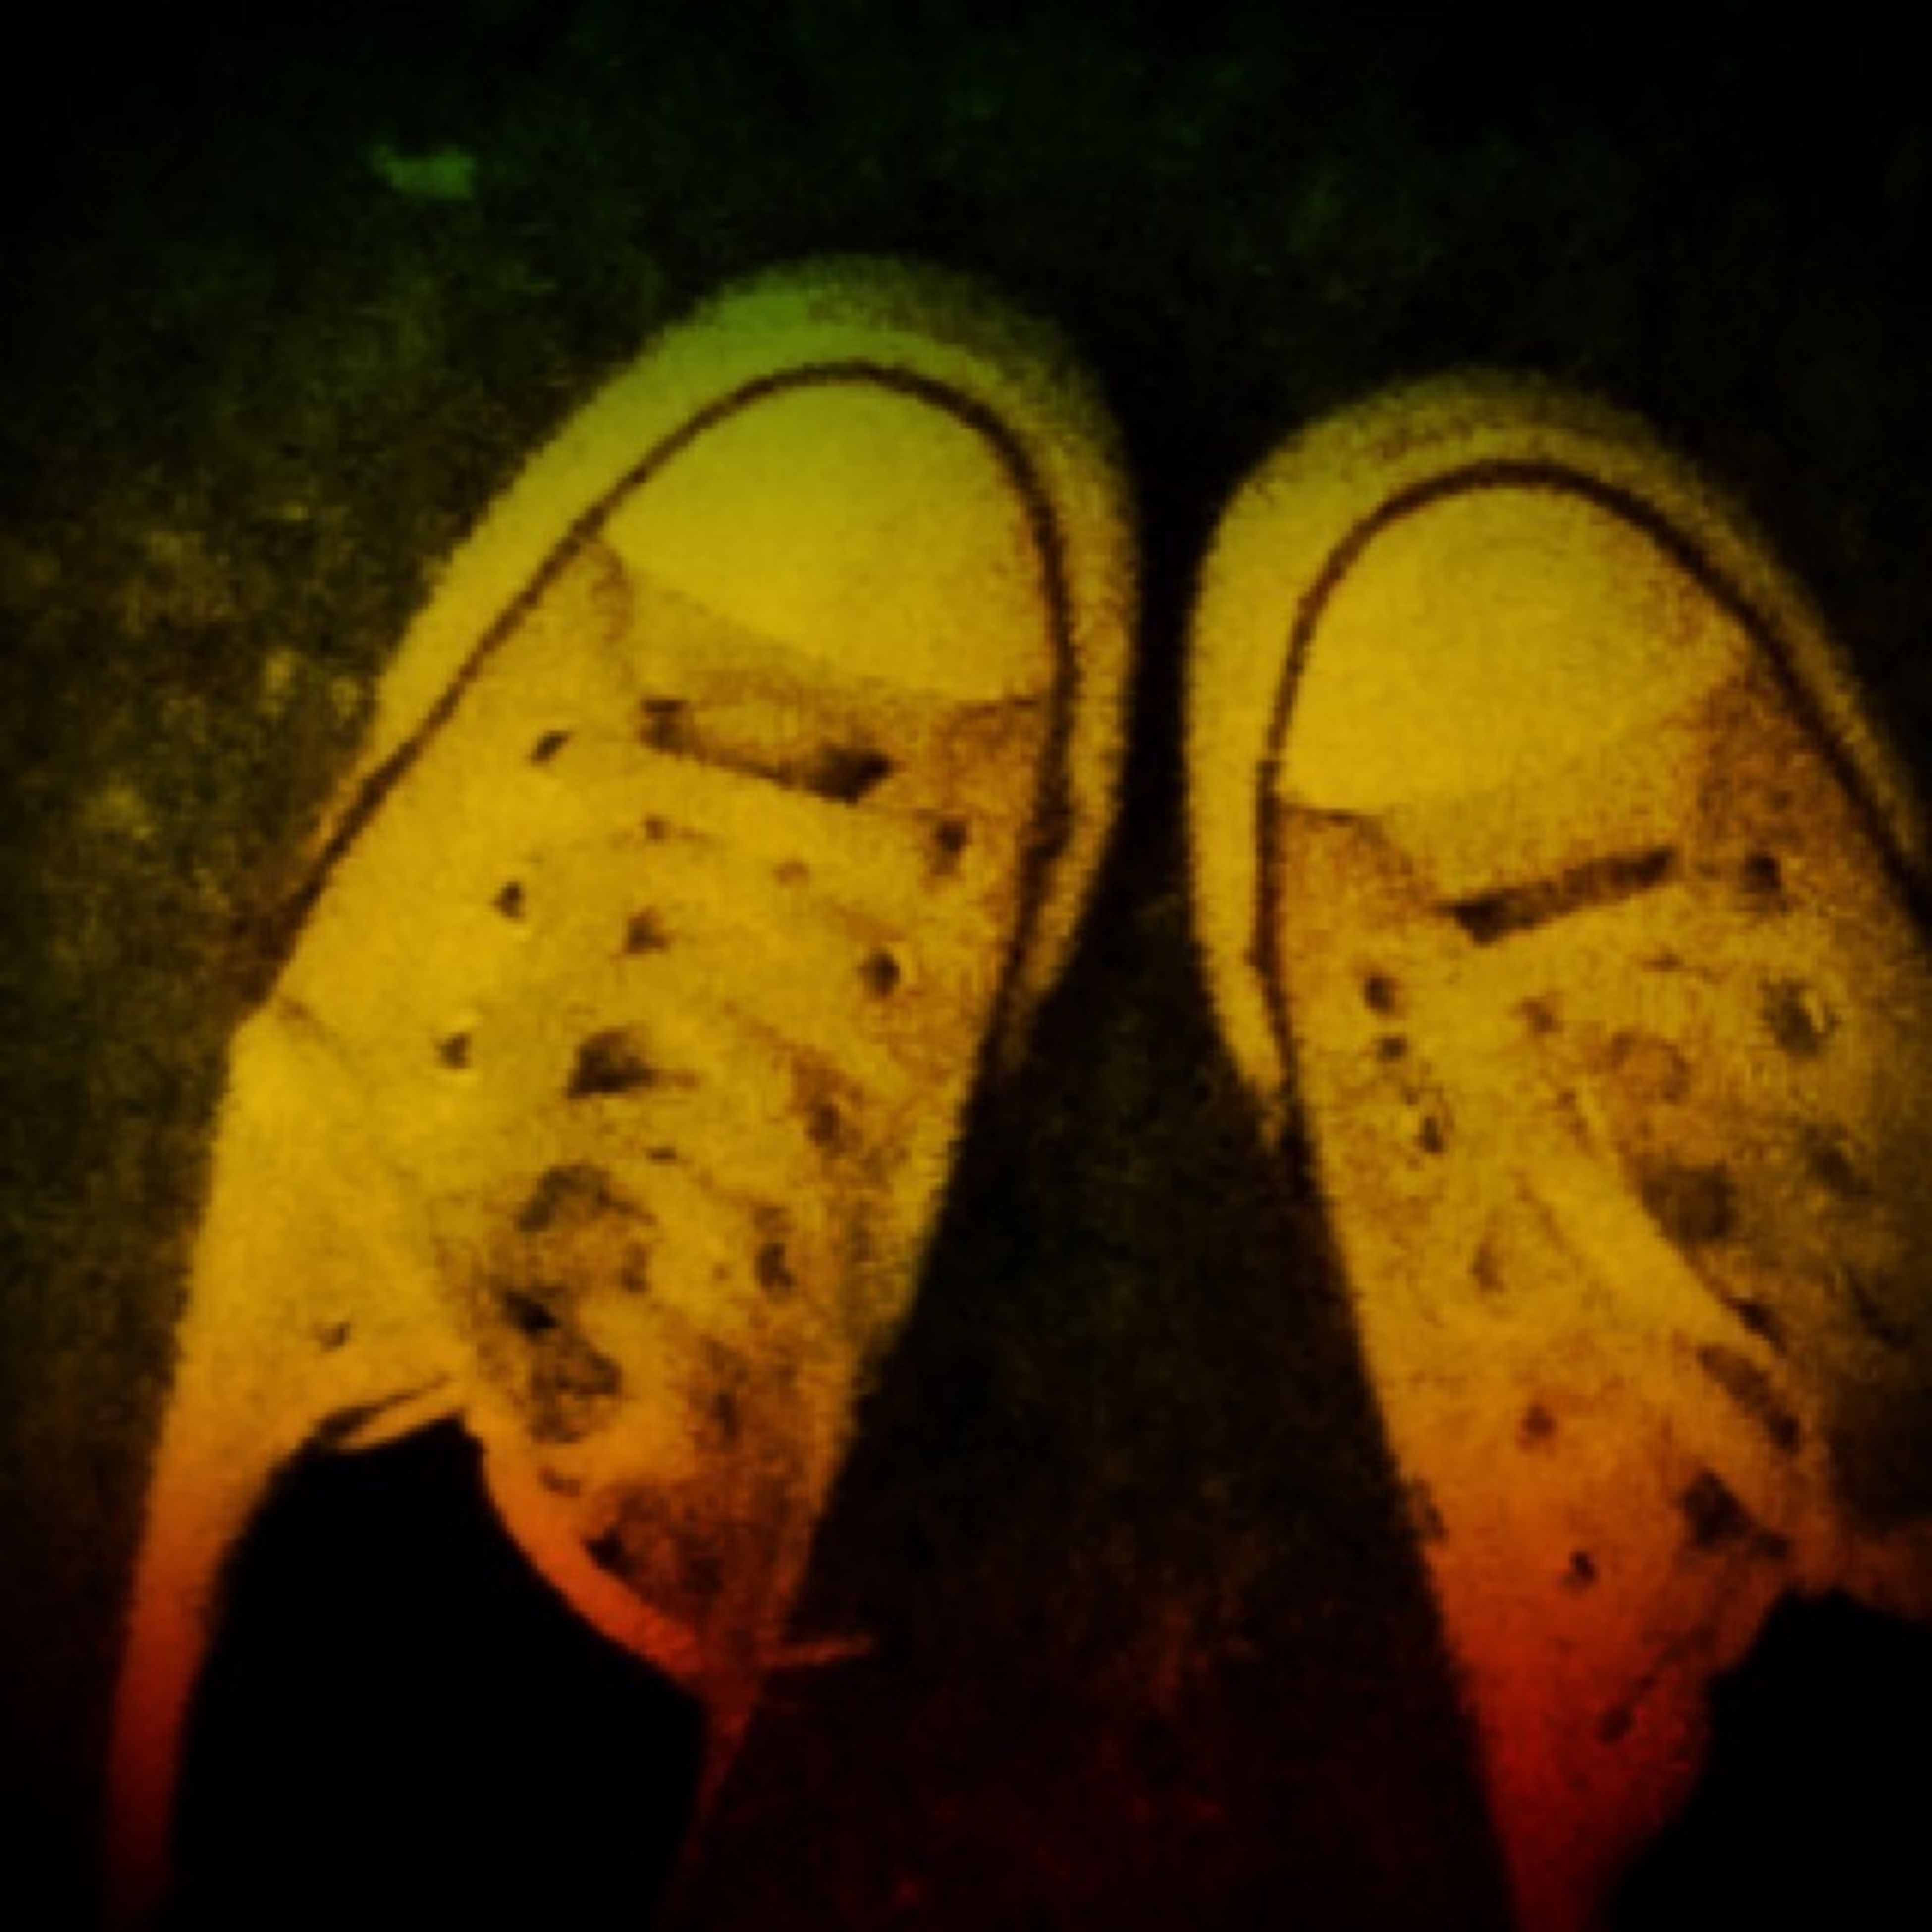 i'll change my shoes. thanks!